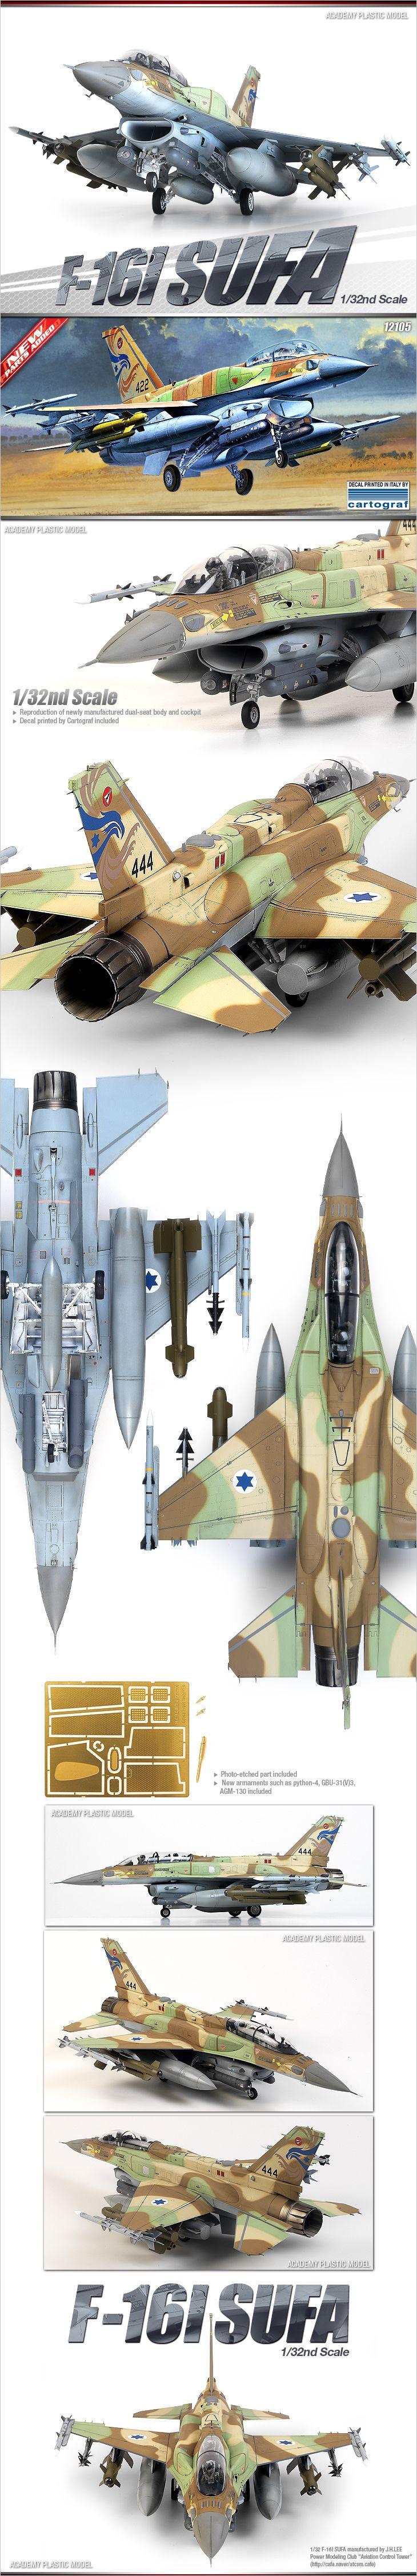 F-16 I Sufa Academy Model Scale 1:32